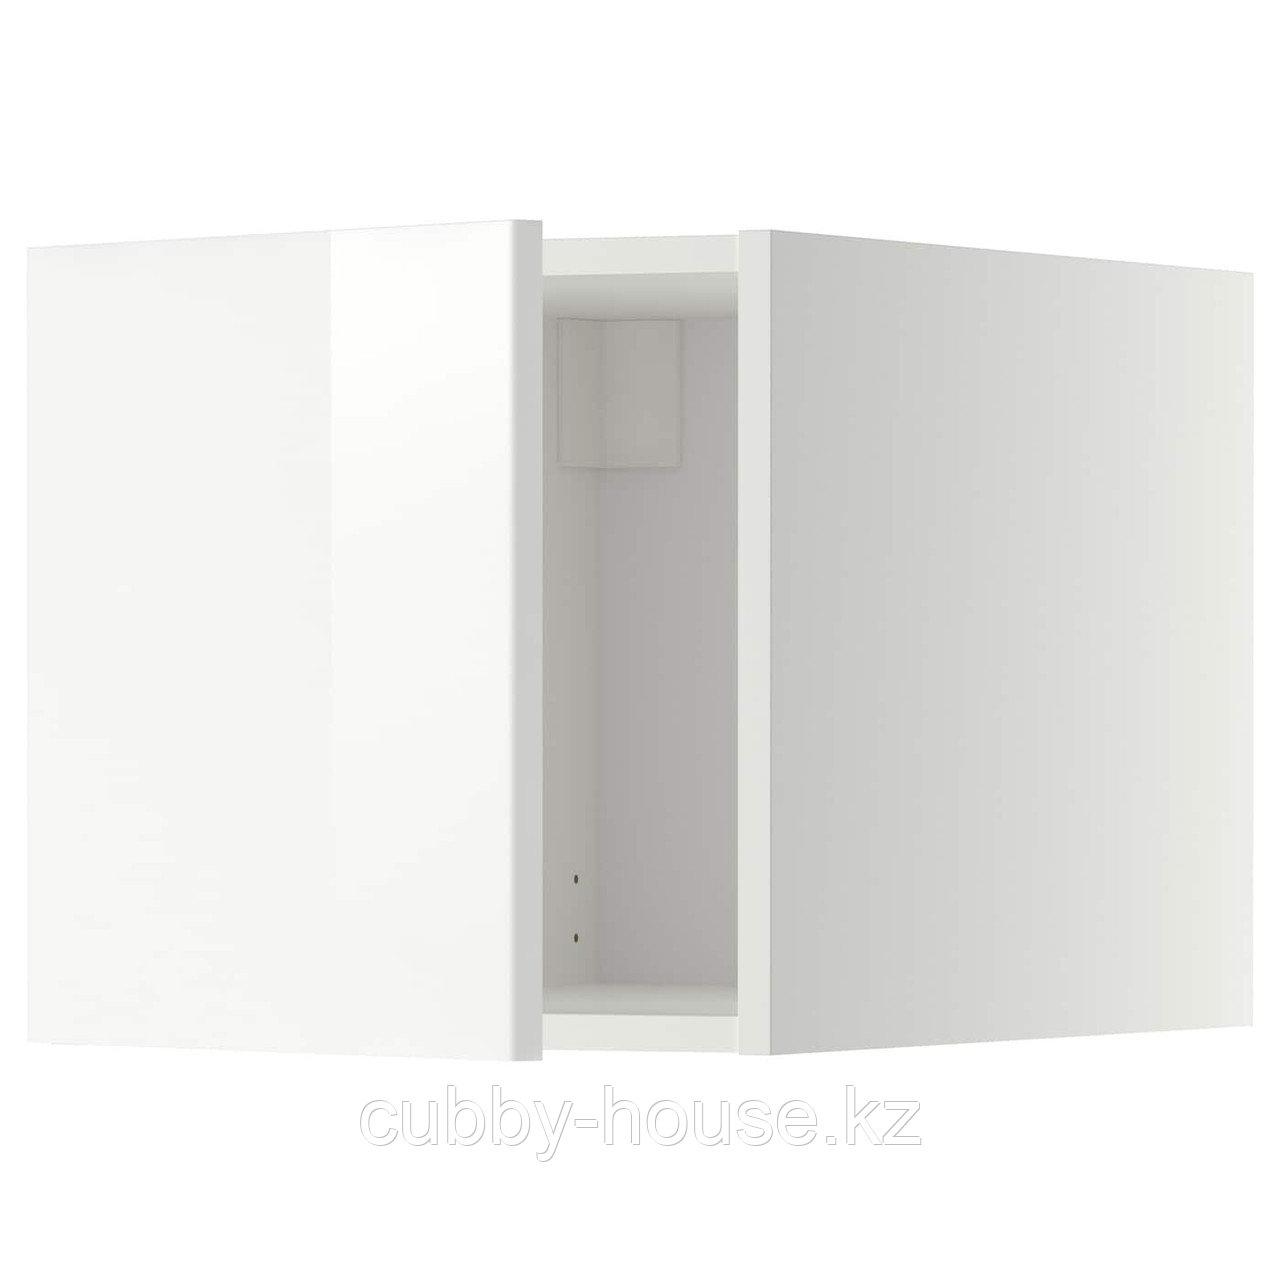 МЕТОД Верхний шкаф, белый, Хэггеби белый, 40x40 см